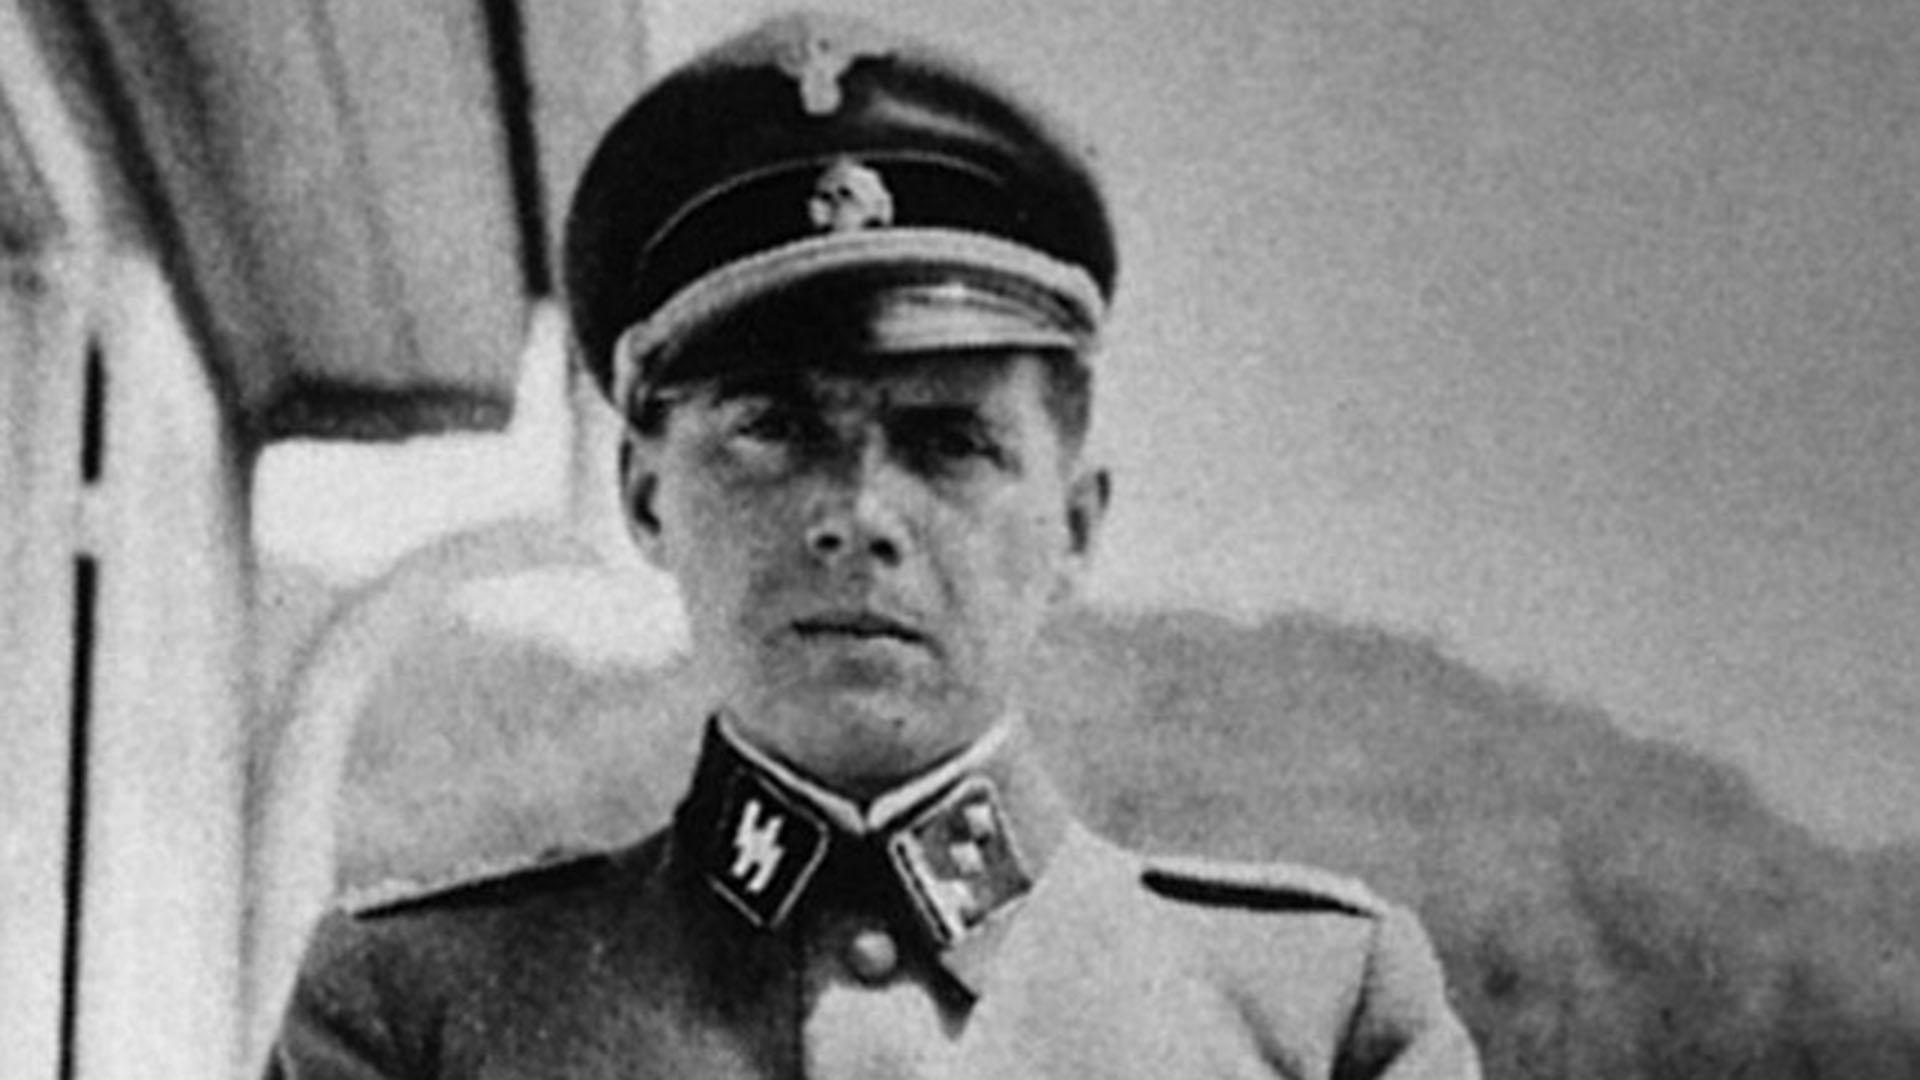 Joseph Mengele